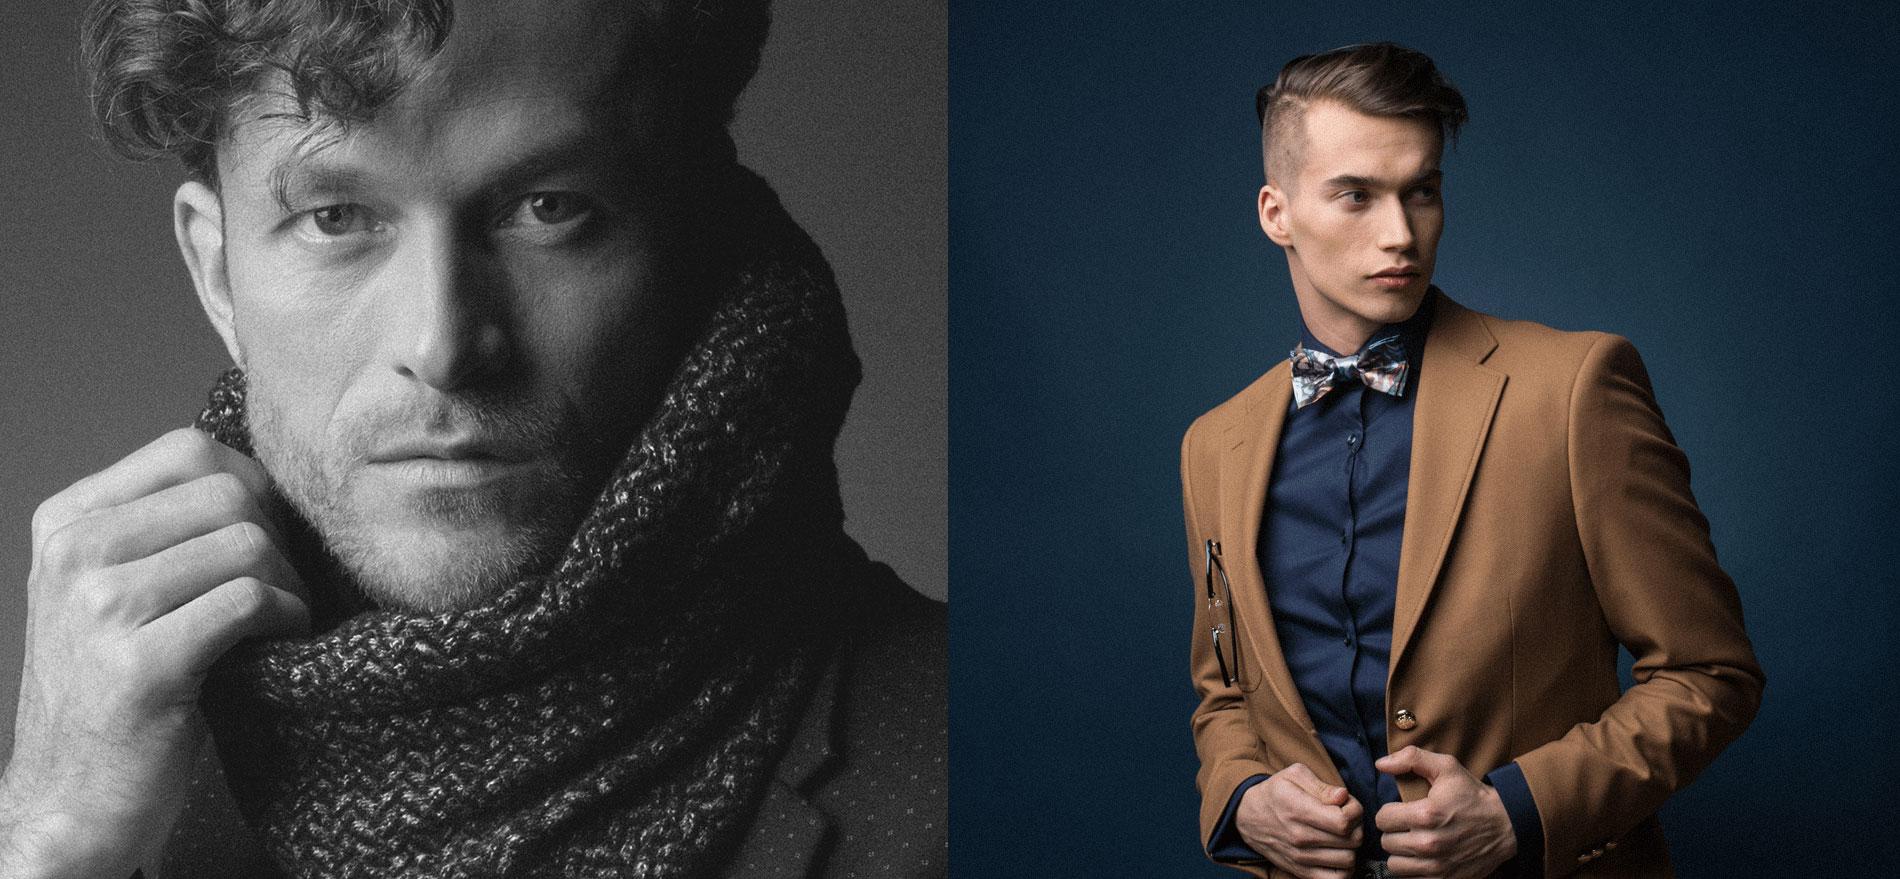 Moda męska muszka i komin Brunon Muszyński